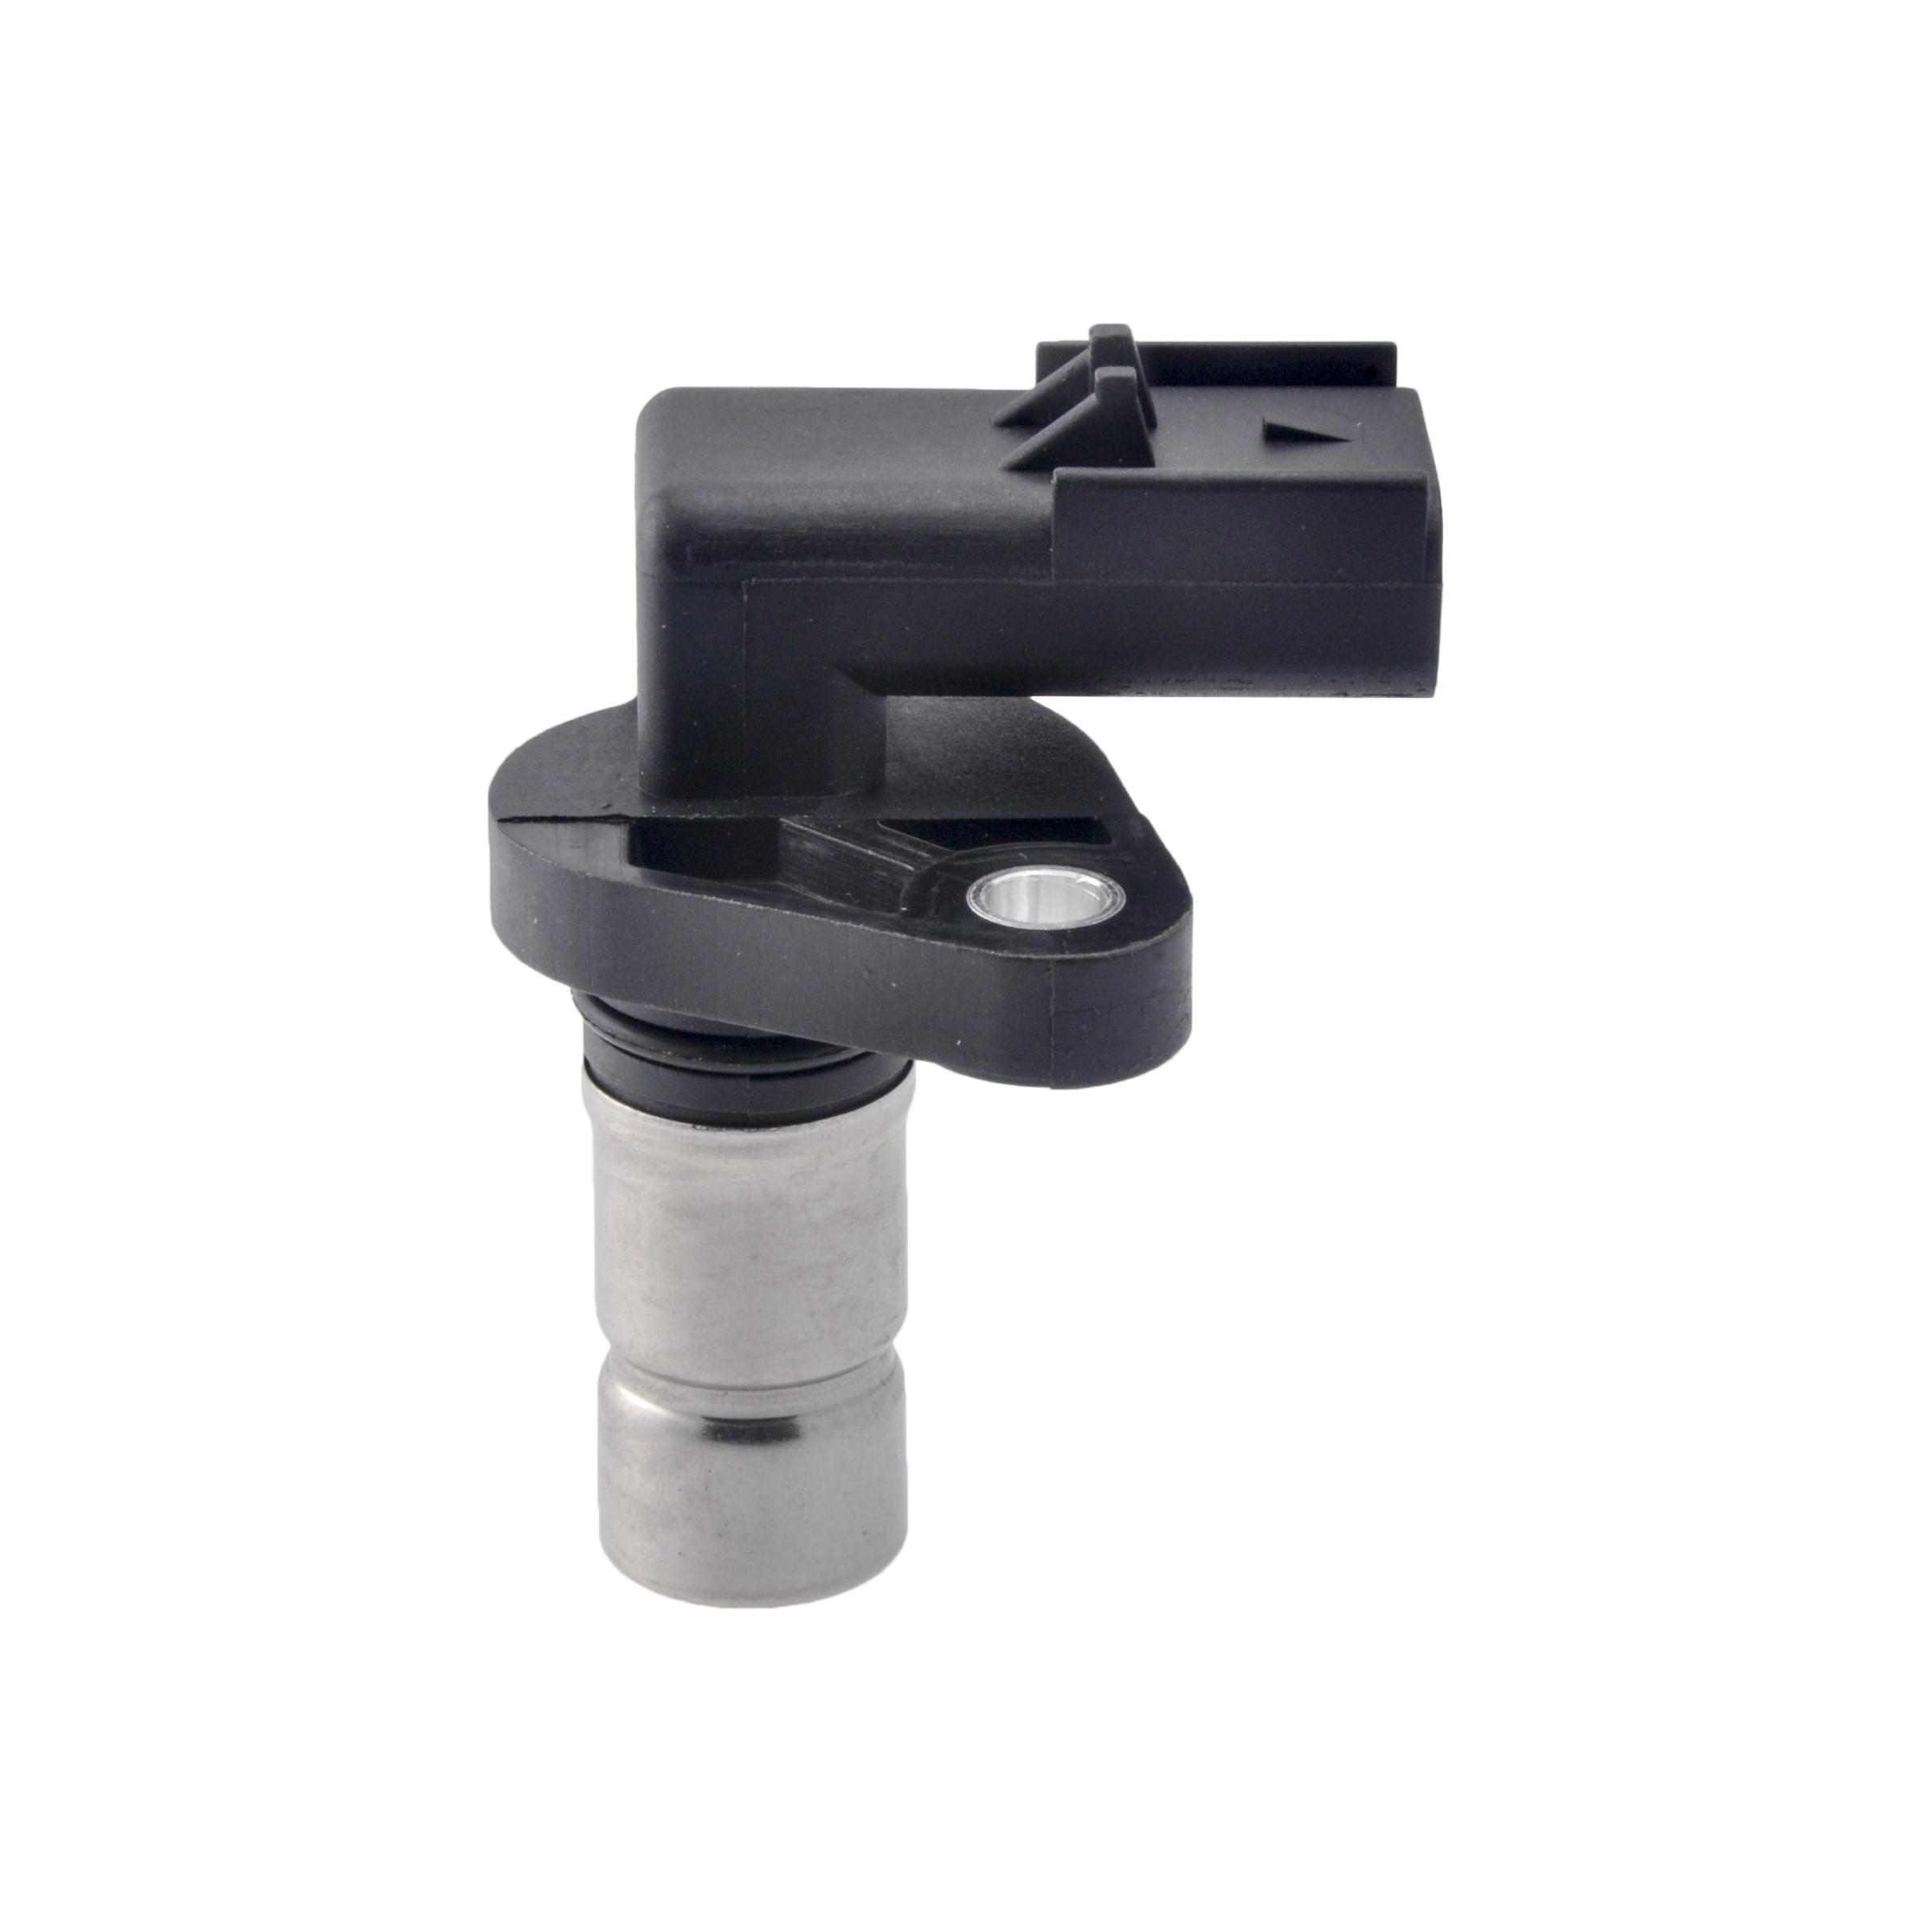 New Herko Crankshaft Position Sensor CKP2021